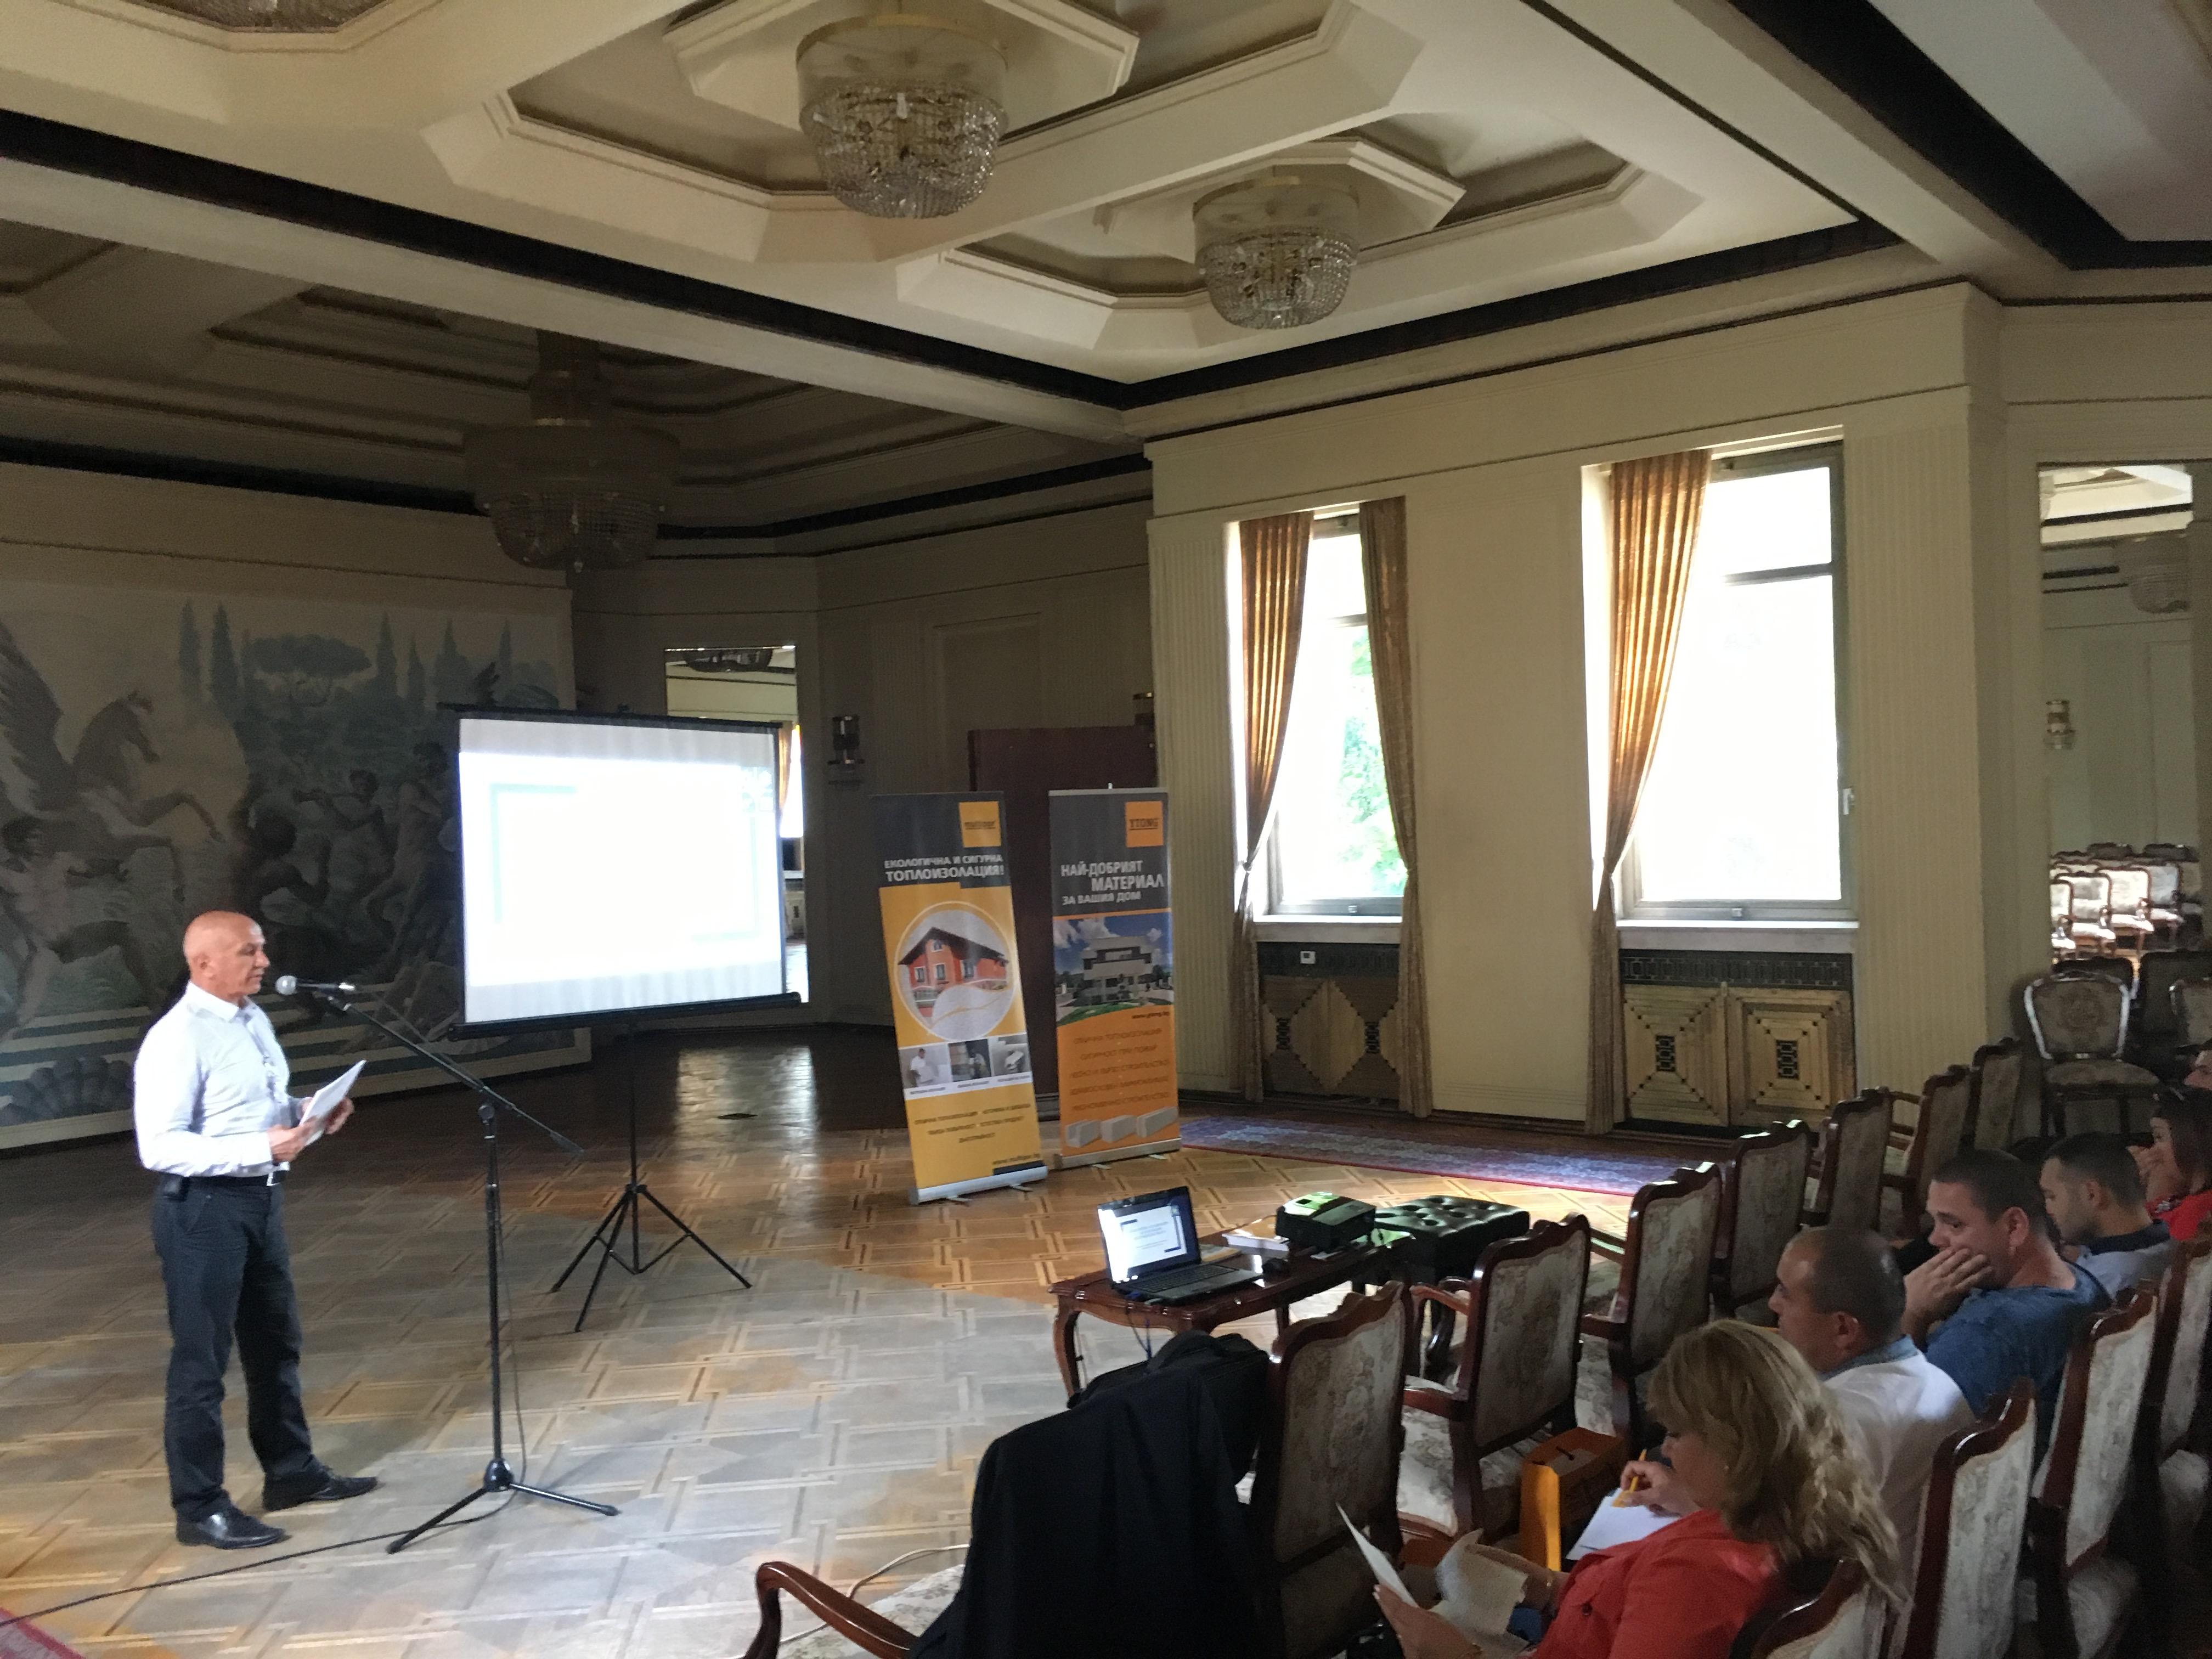 БАИС, ЕнЕфект и Община Добрич с успешно обучение по енергийна ефективност